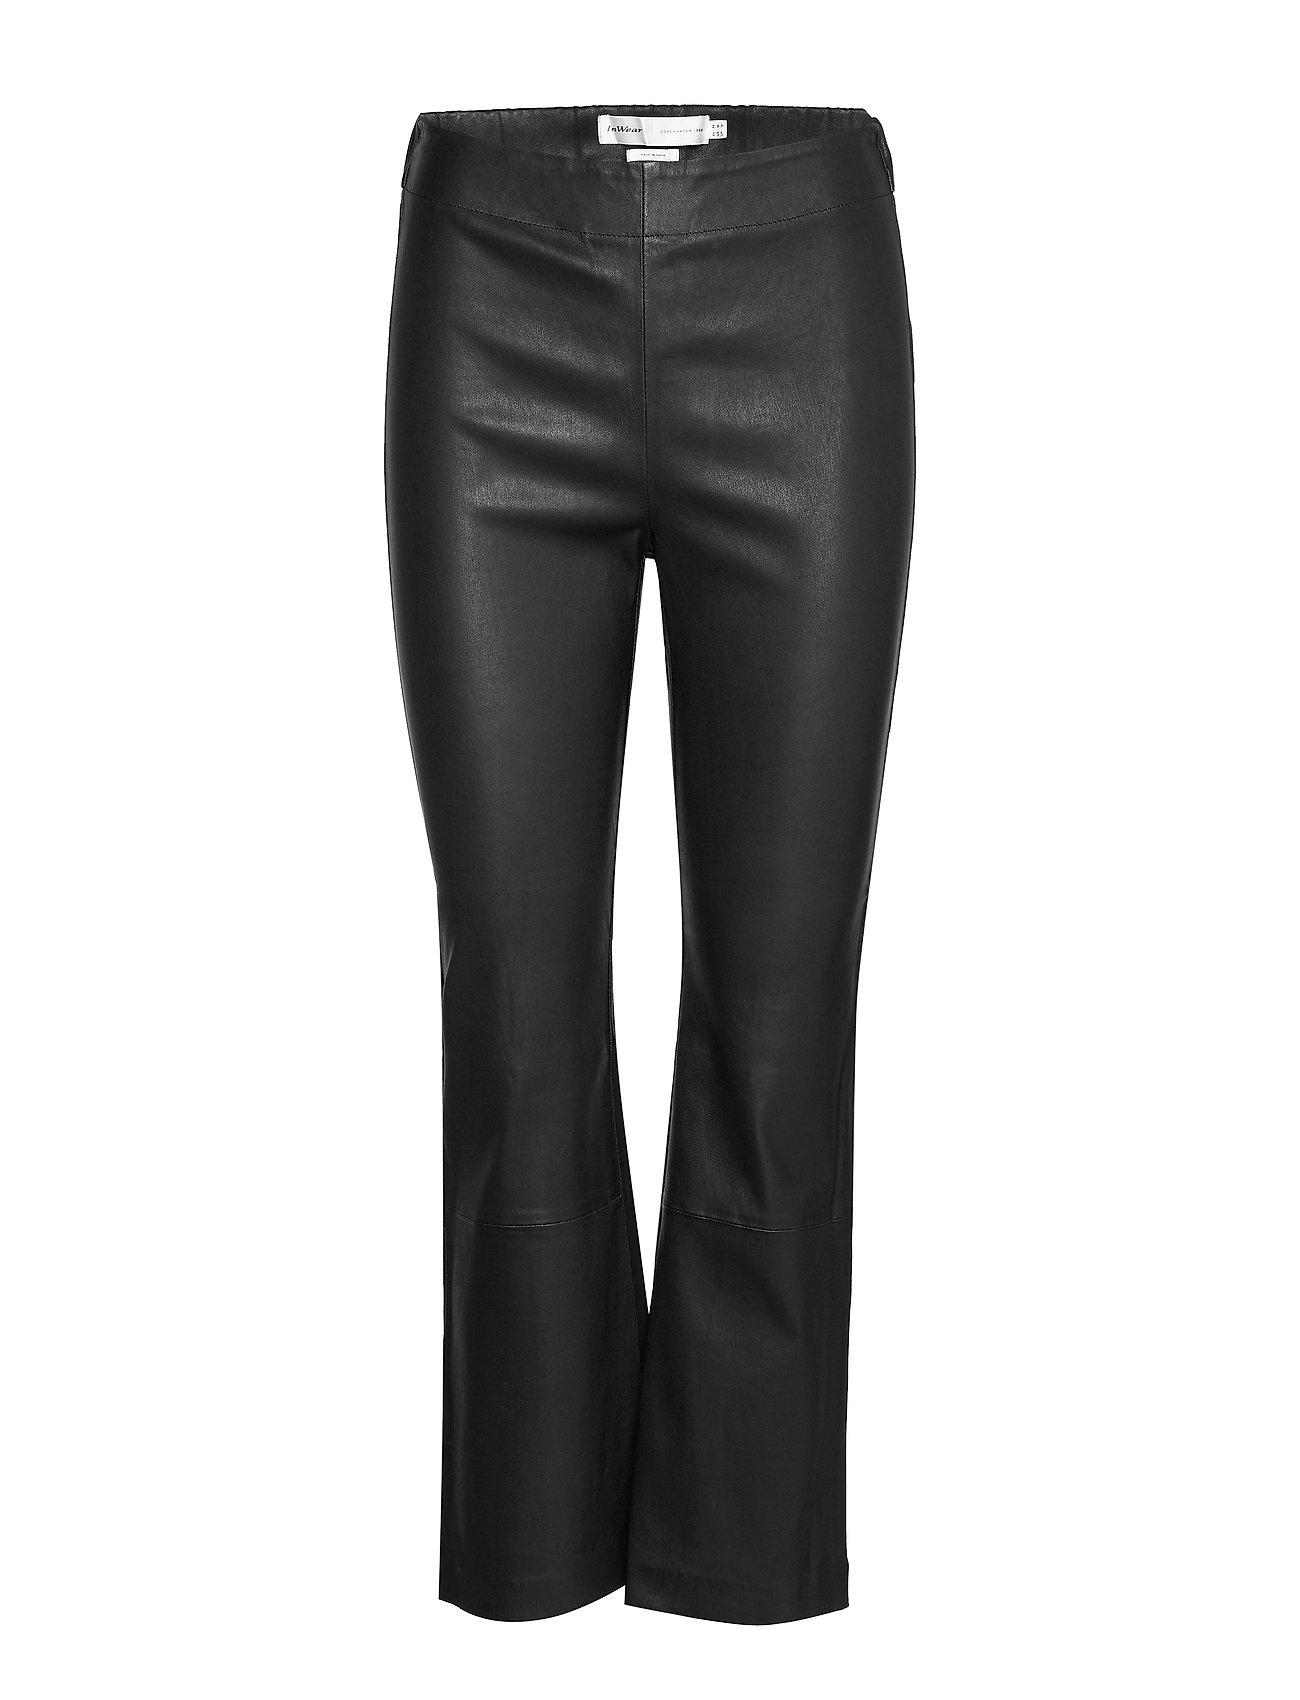 InWear Cedar Pant - BLACK